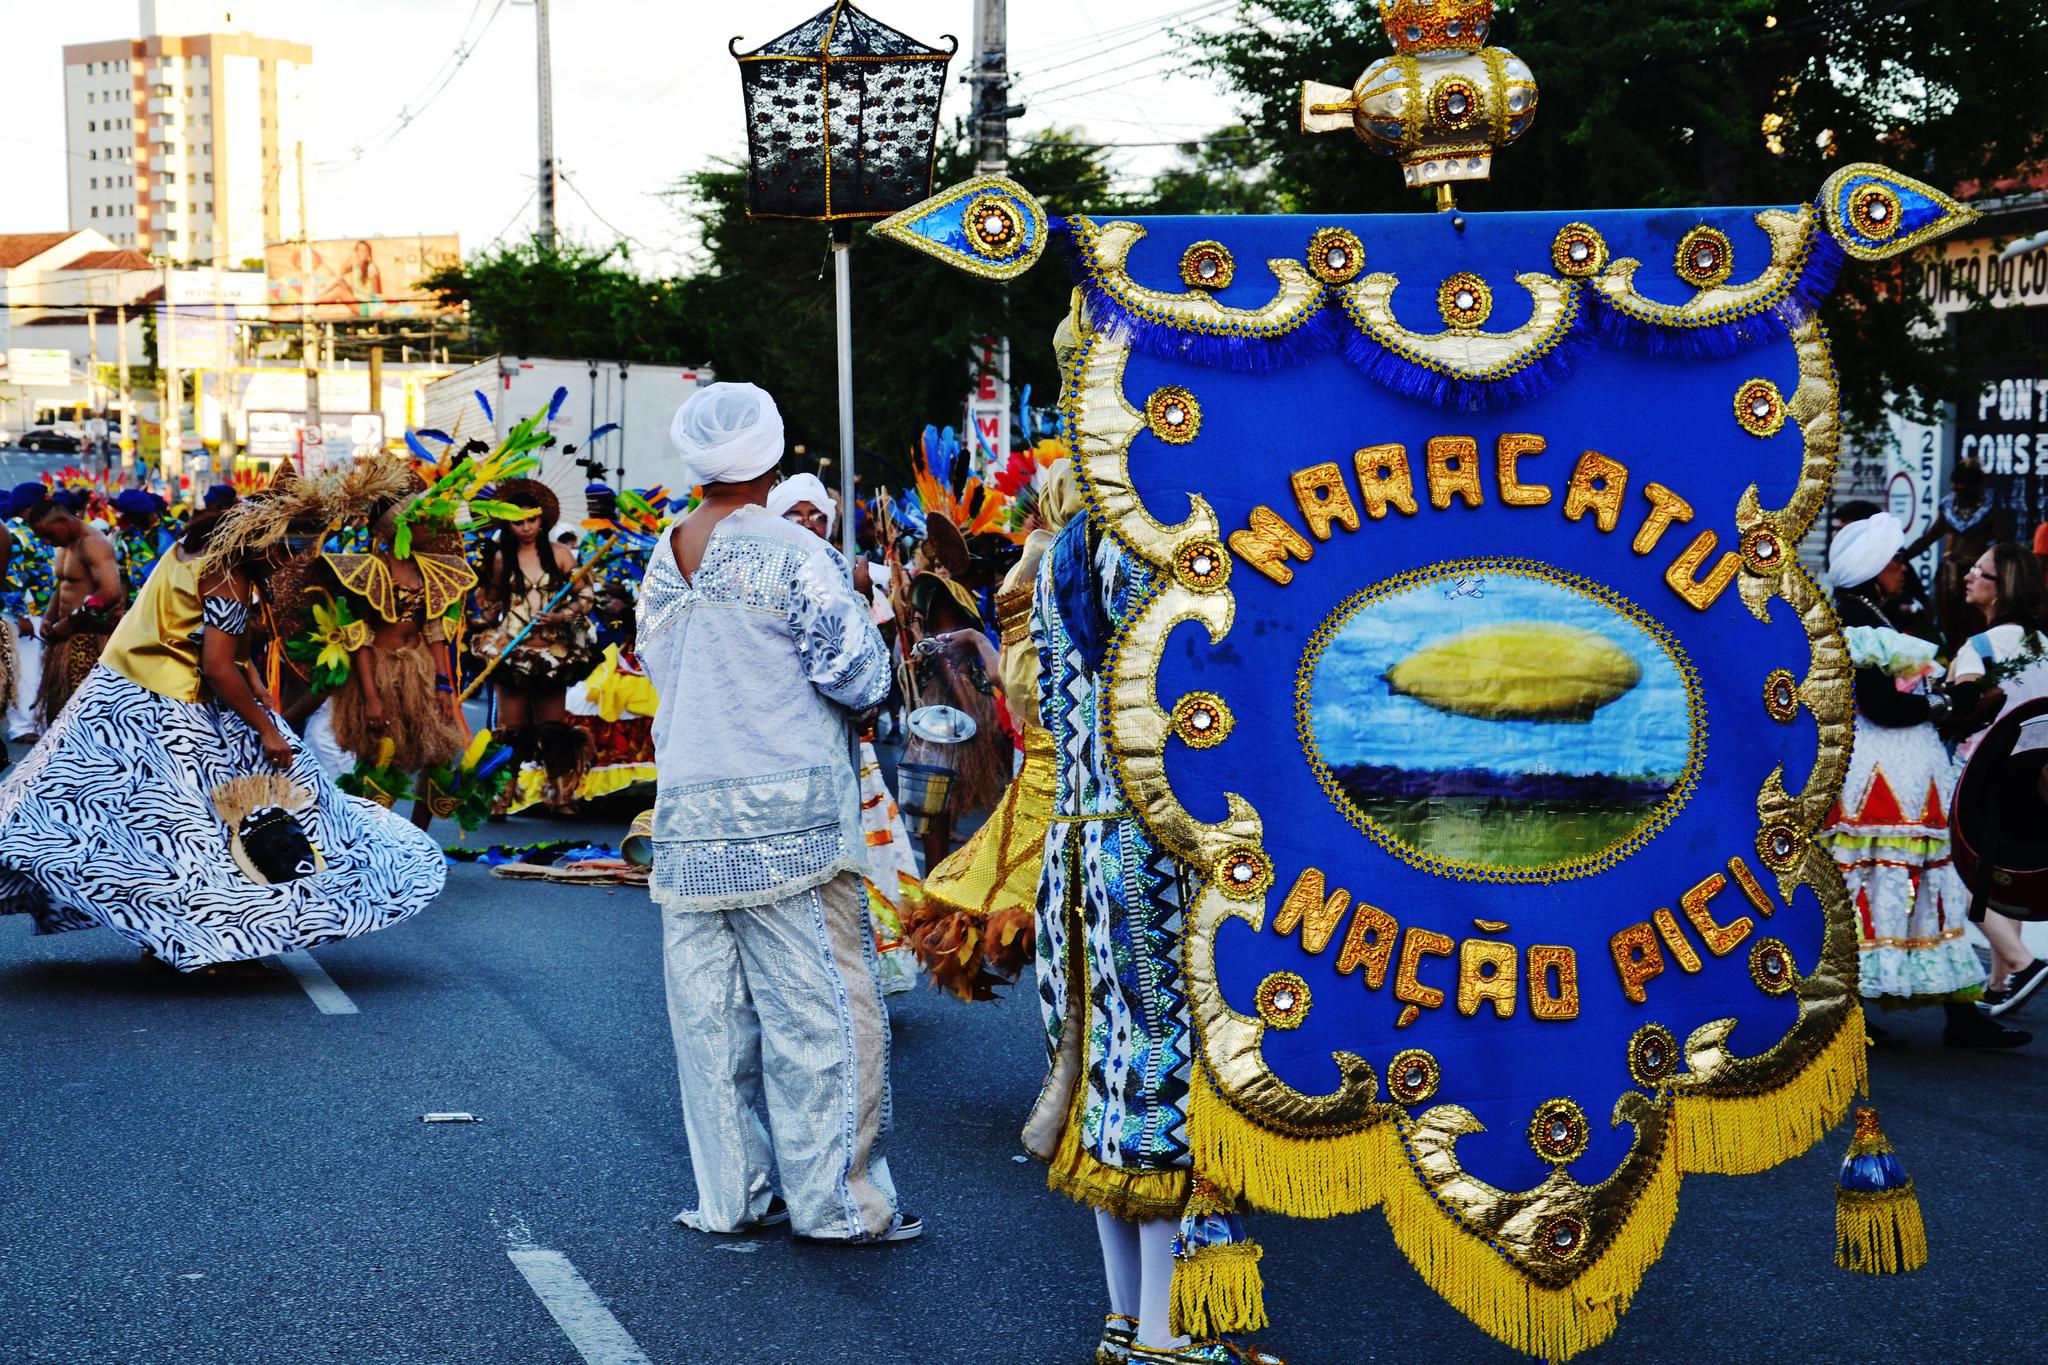 Tradicionais desfiles de Maracatu marcam o Carnaval de Fortaleza (FOTO: Louis Renard/Flickr Creative Commons)